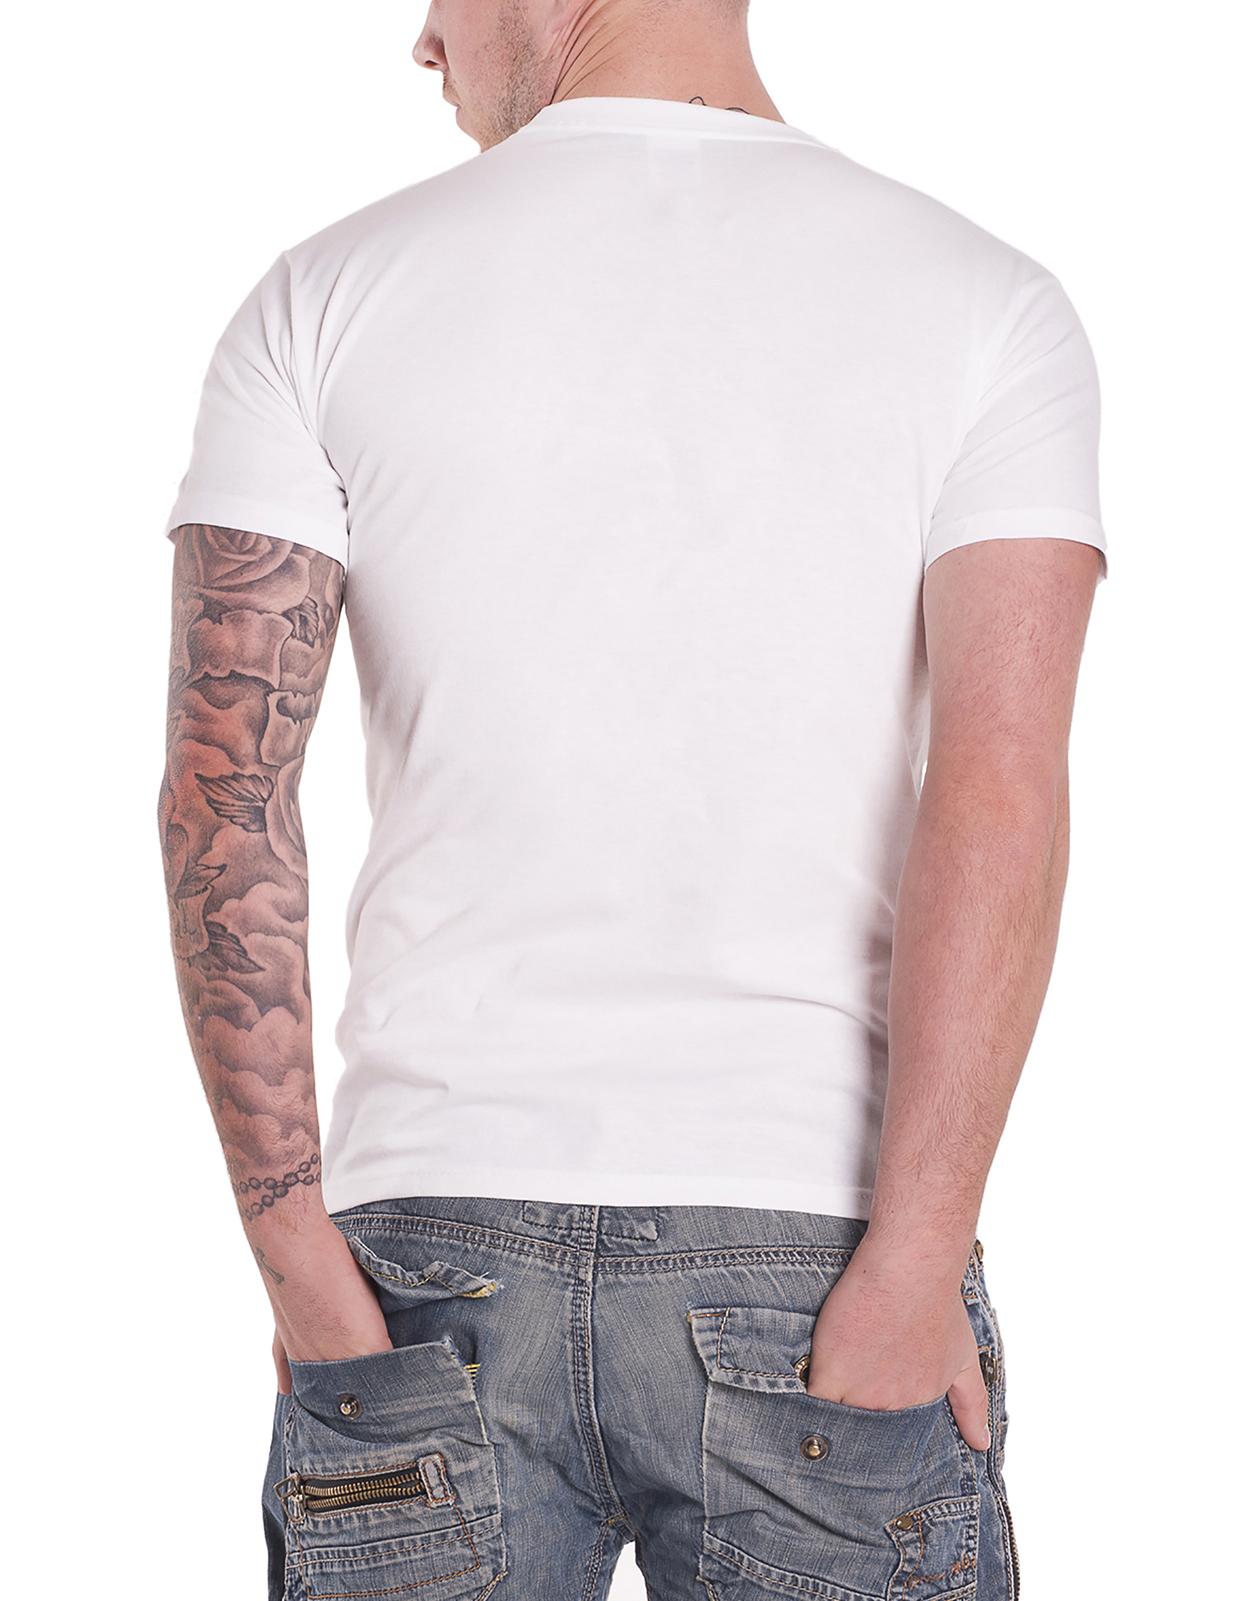 Official-Motley-Crue-T-Shirt-Shout-at-the-Devil-The-Dirt-Tour-Band-Logo-Mens thumbnail 27